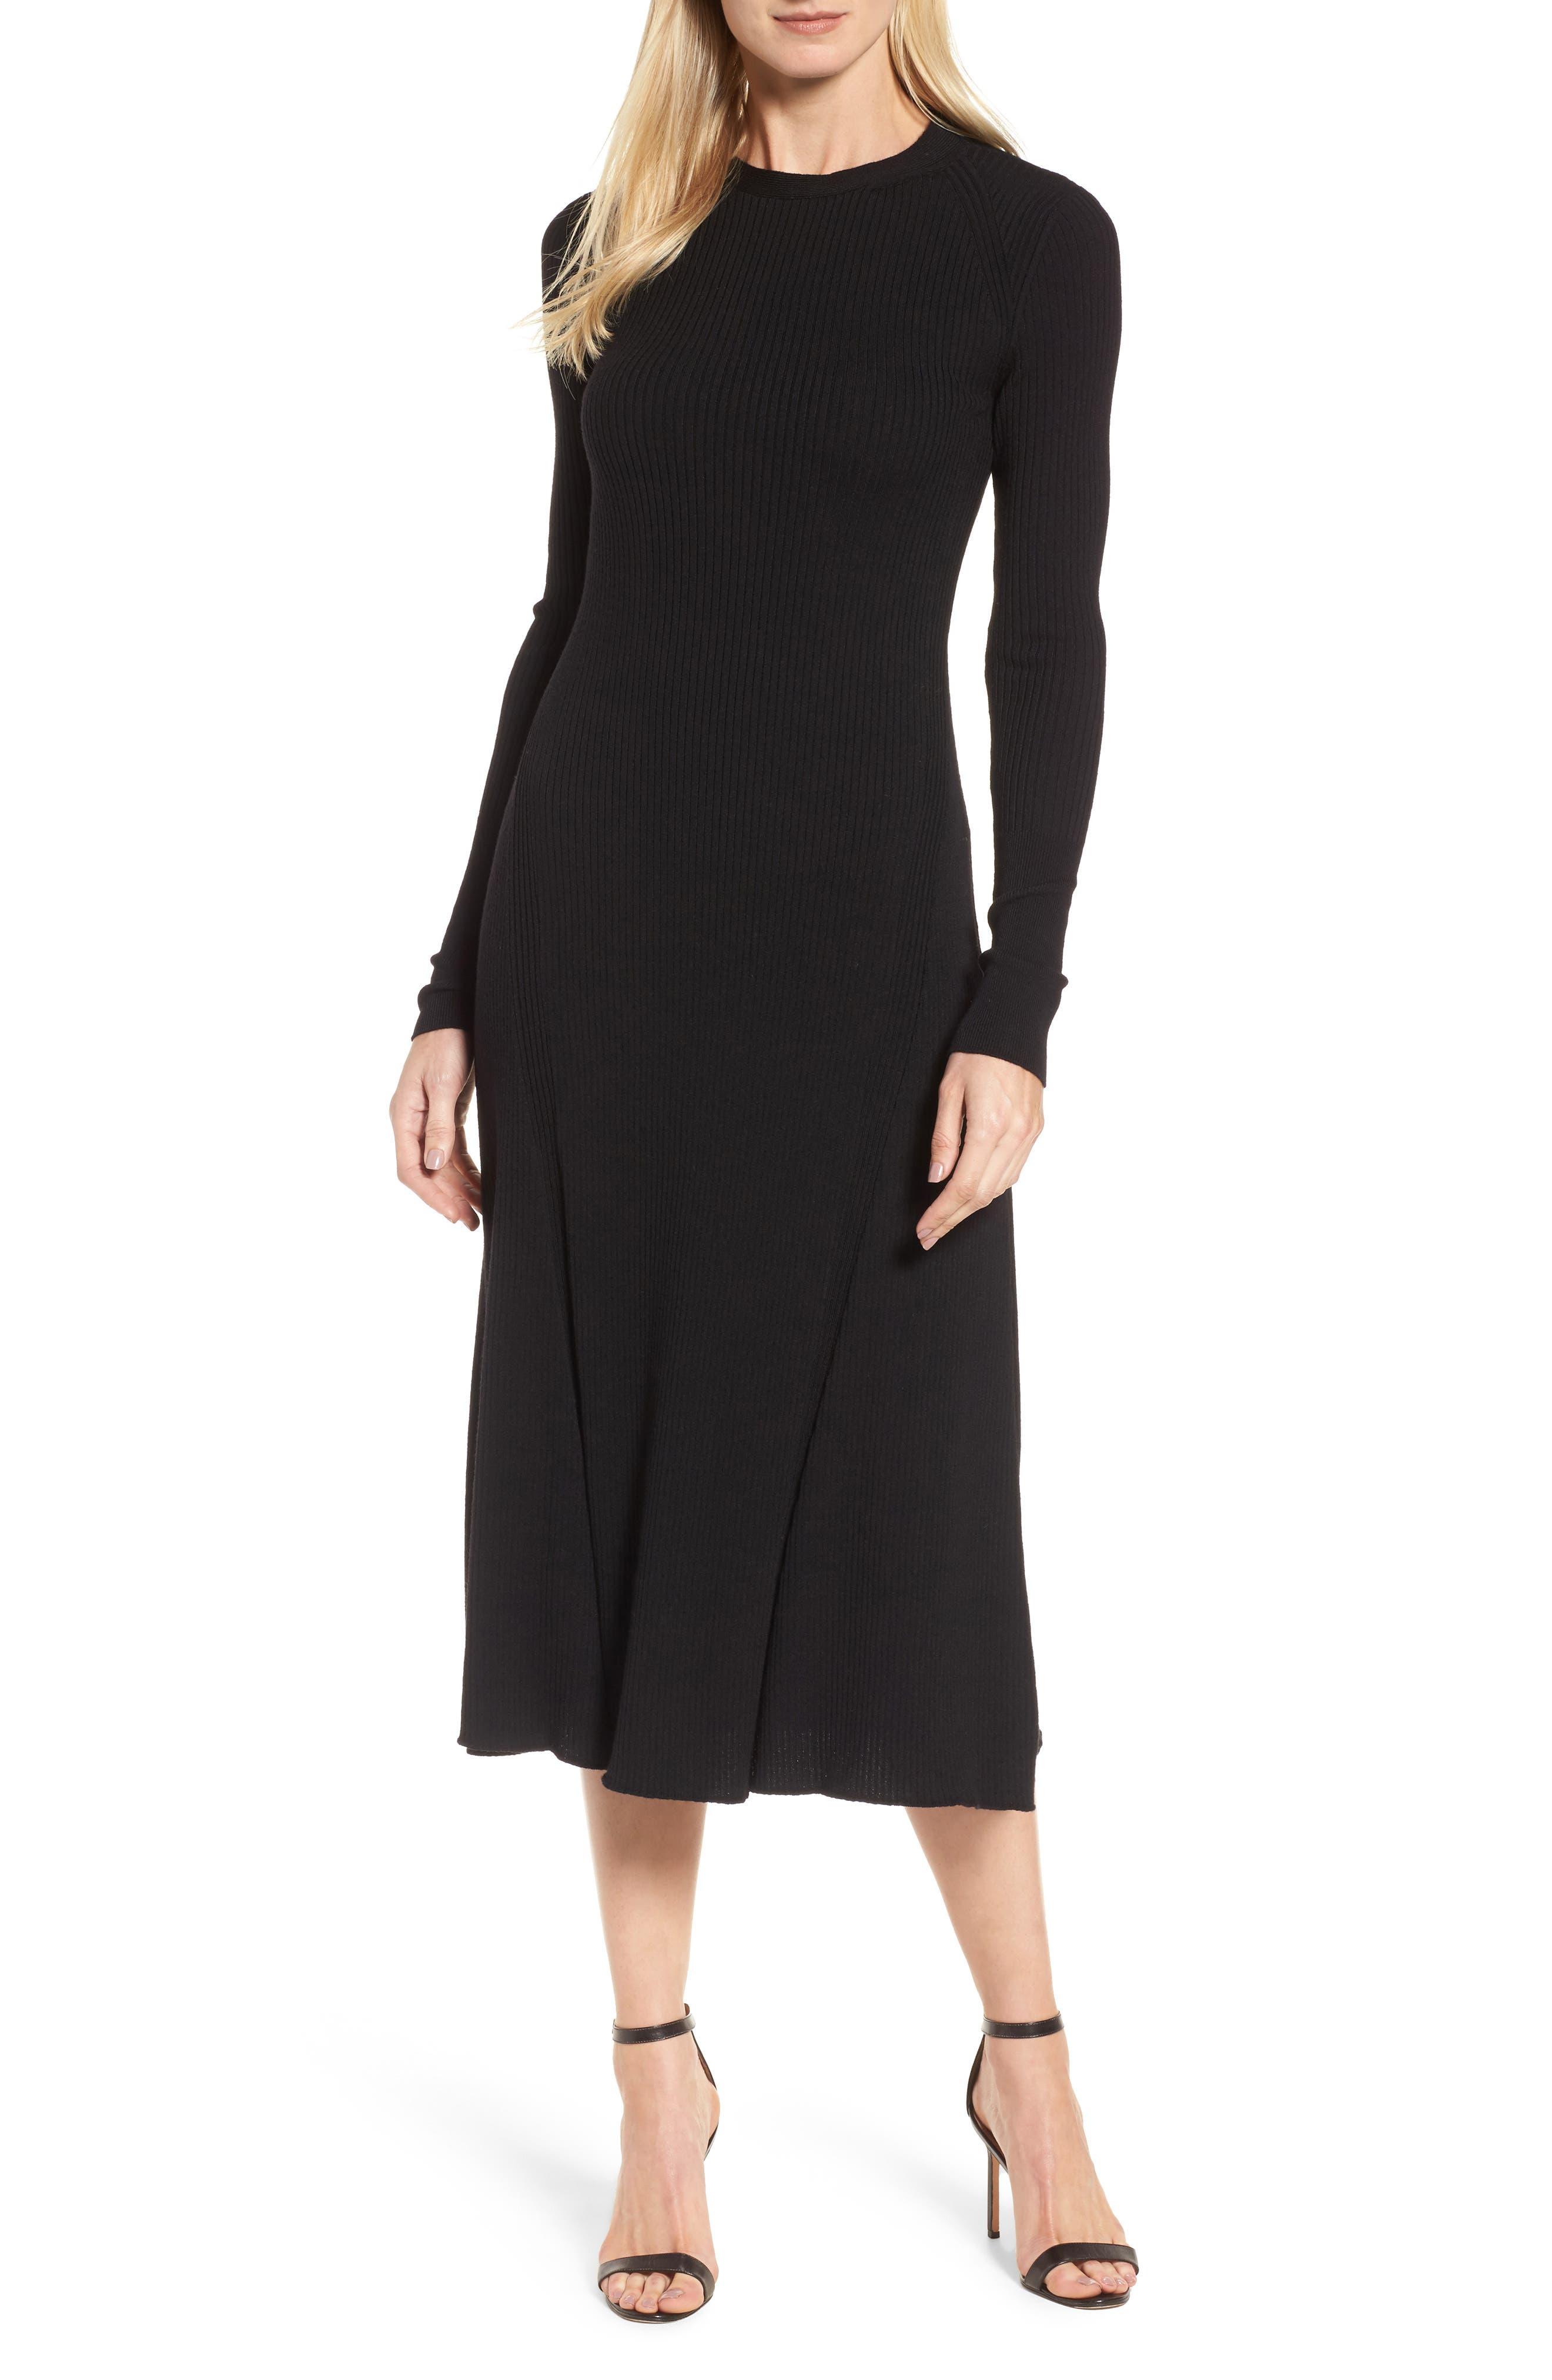 Faustine Midi Dress,                             Main thumbnail 1, color,                             001